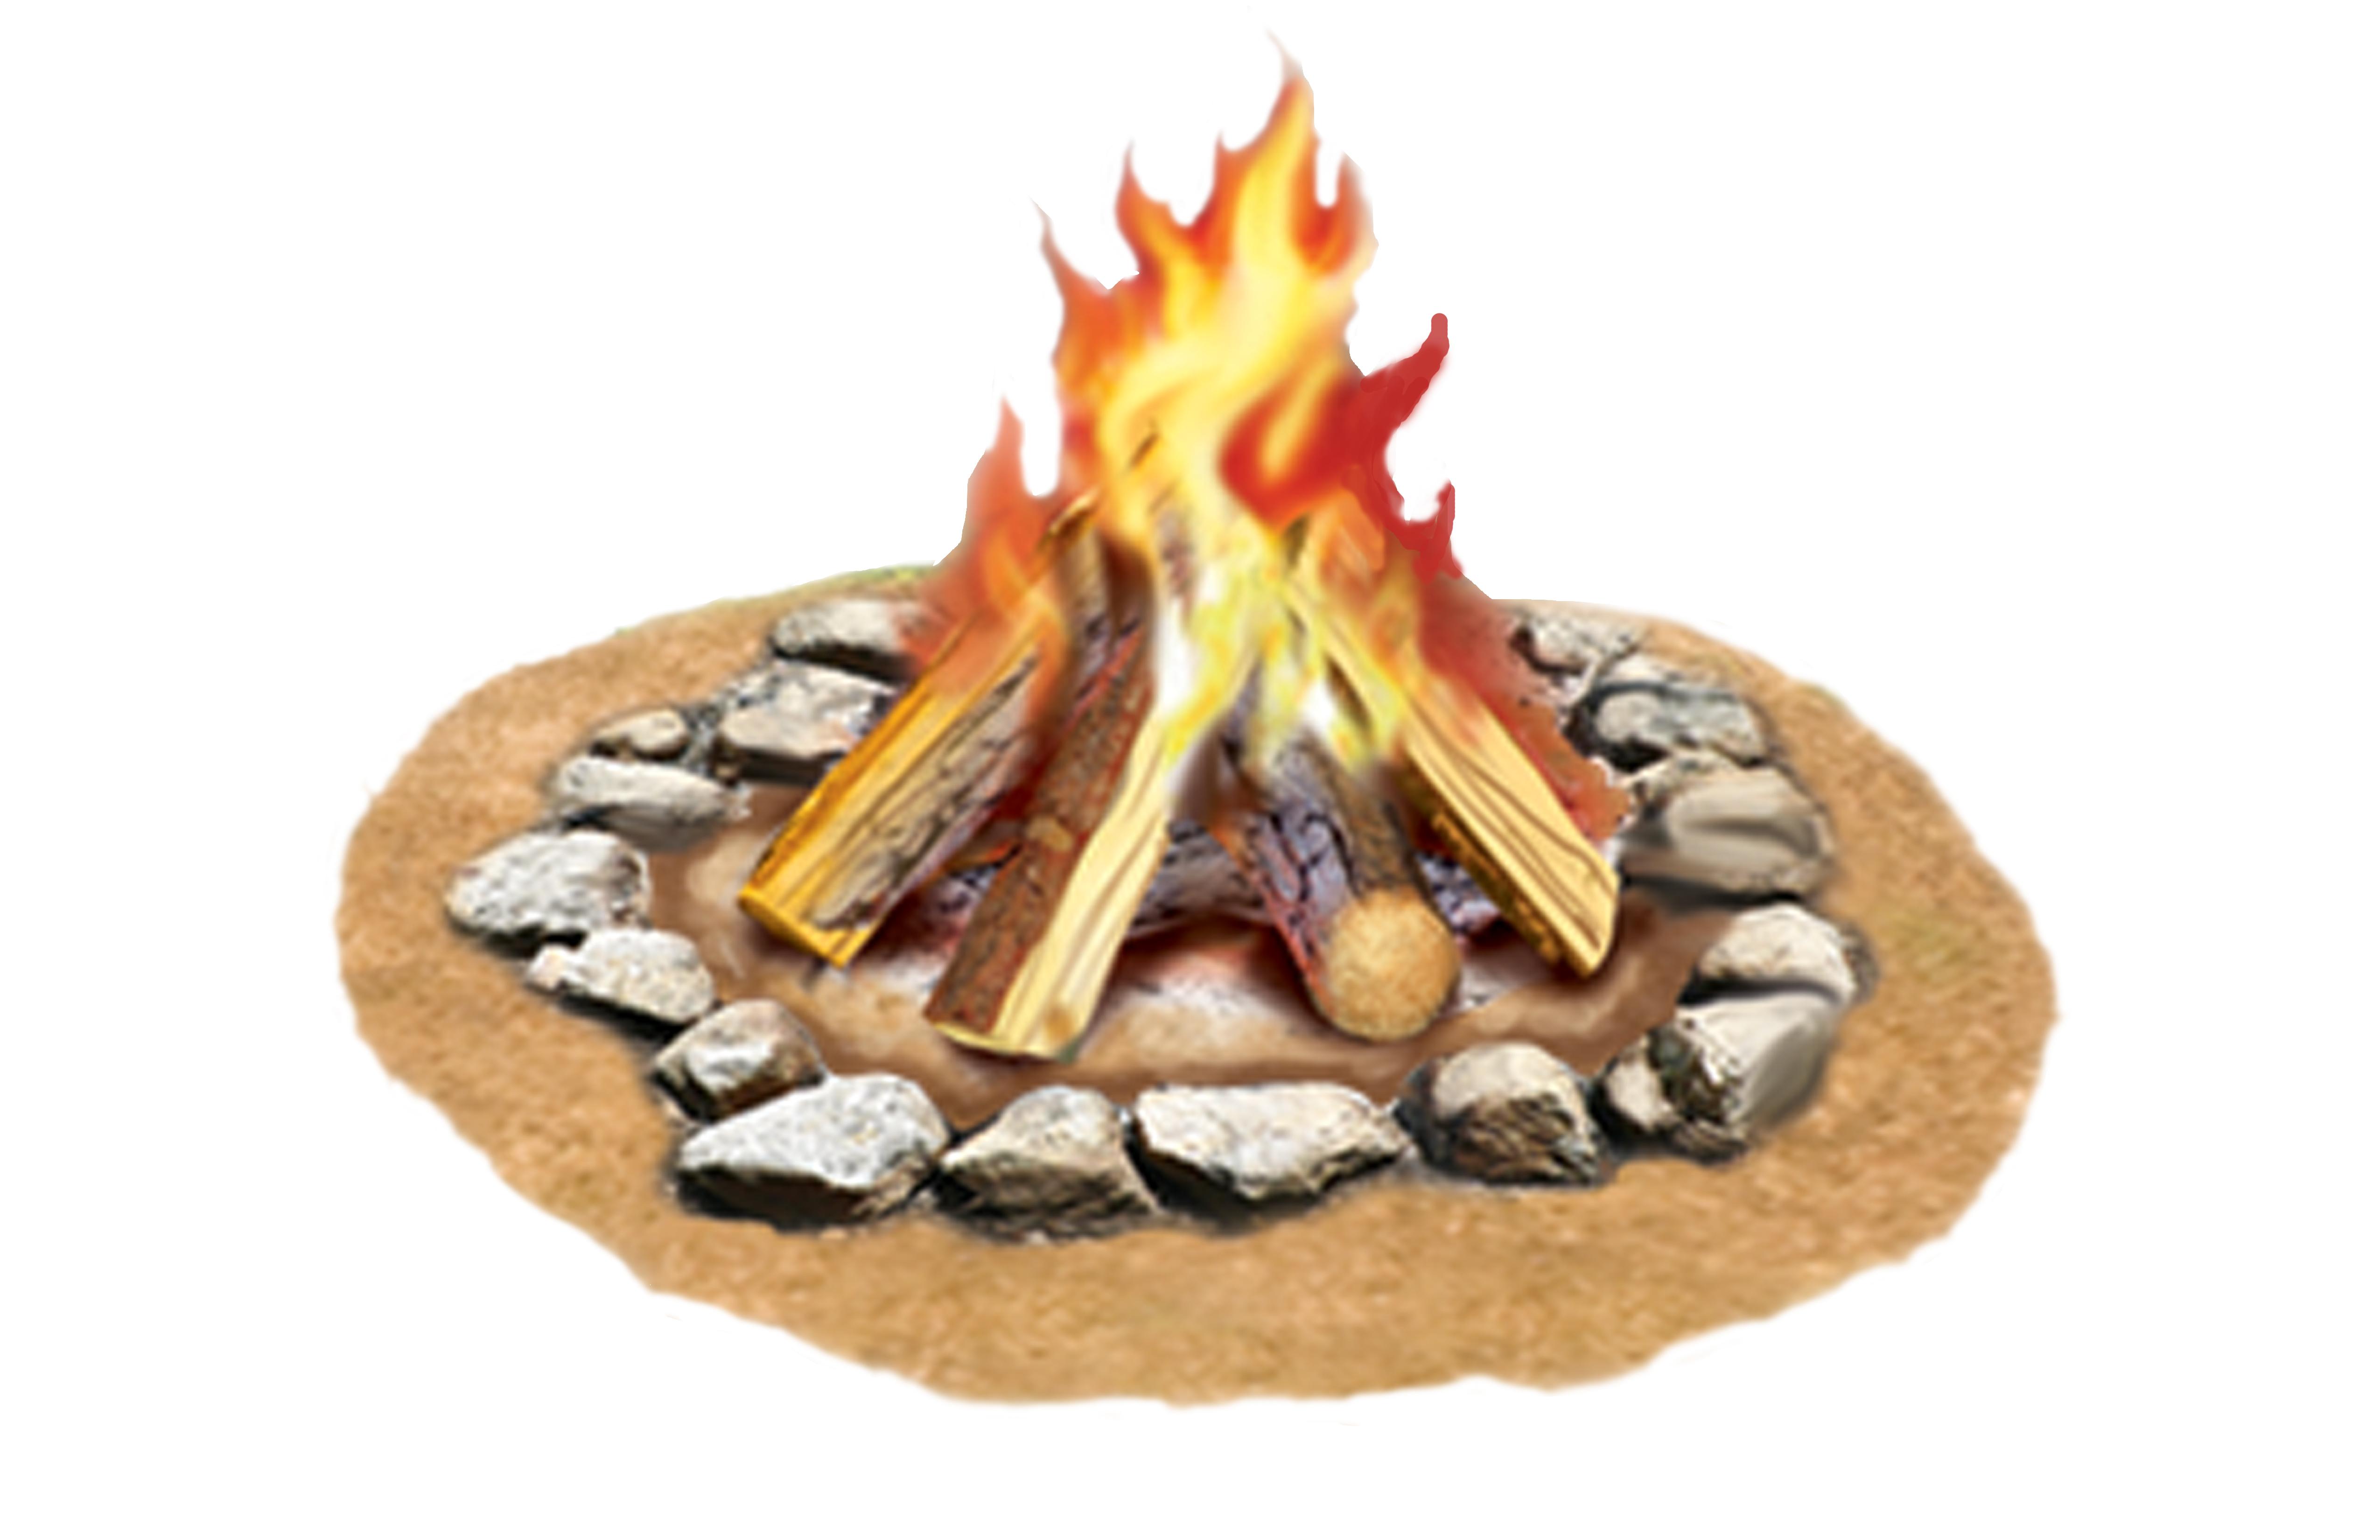 Campfire Clipart & Campfire Clip Art Images.